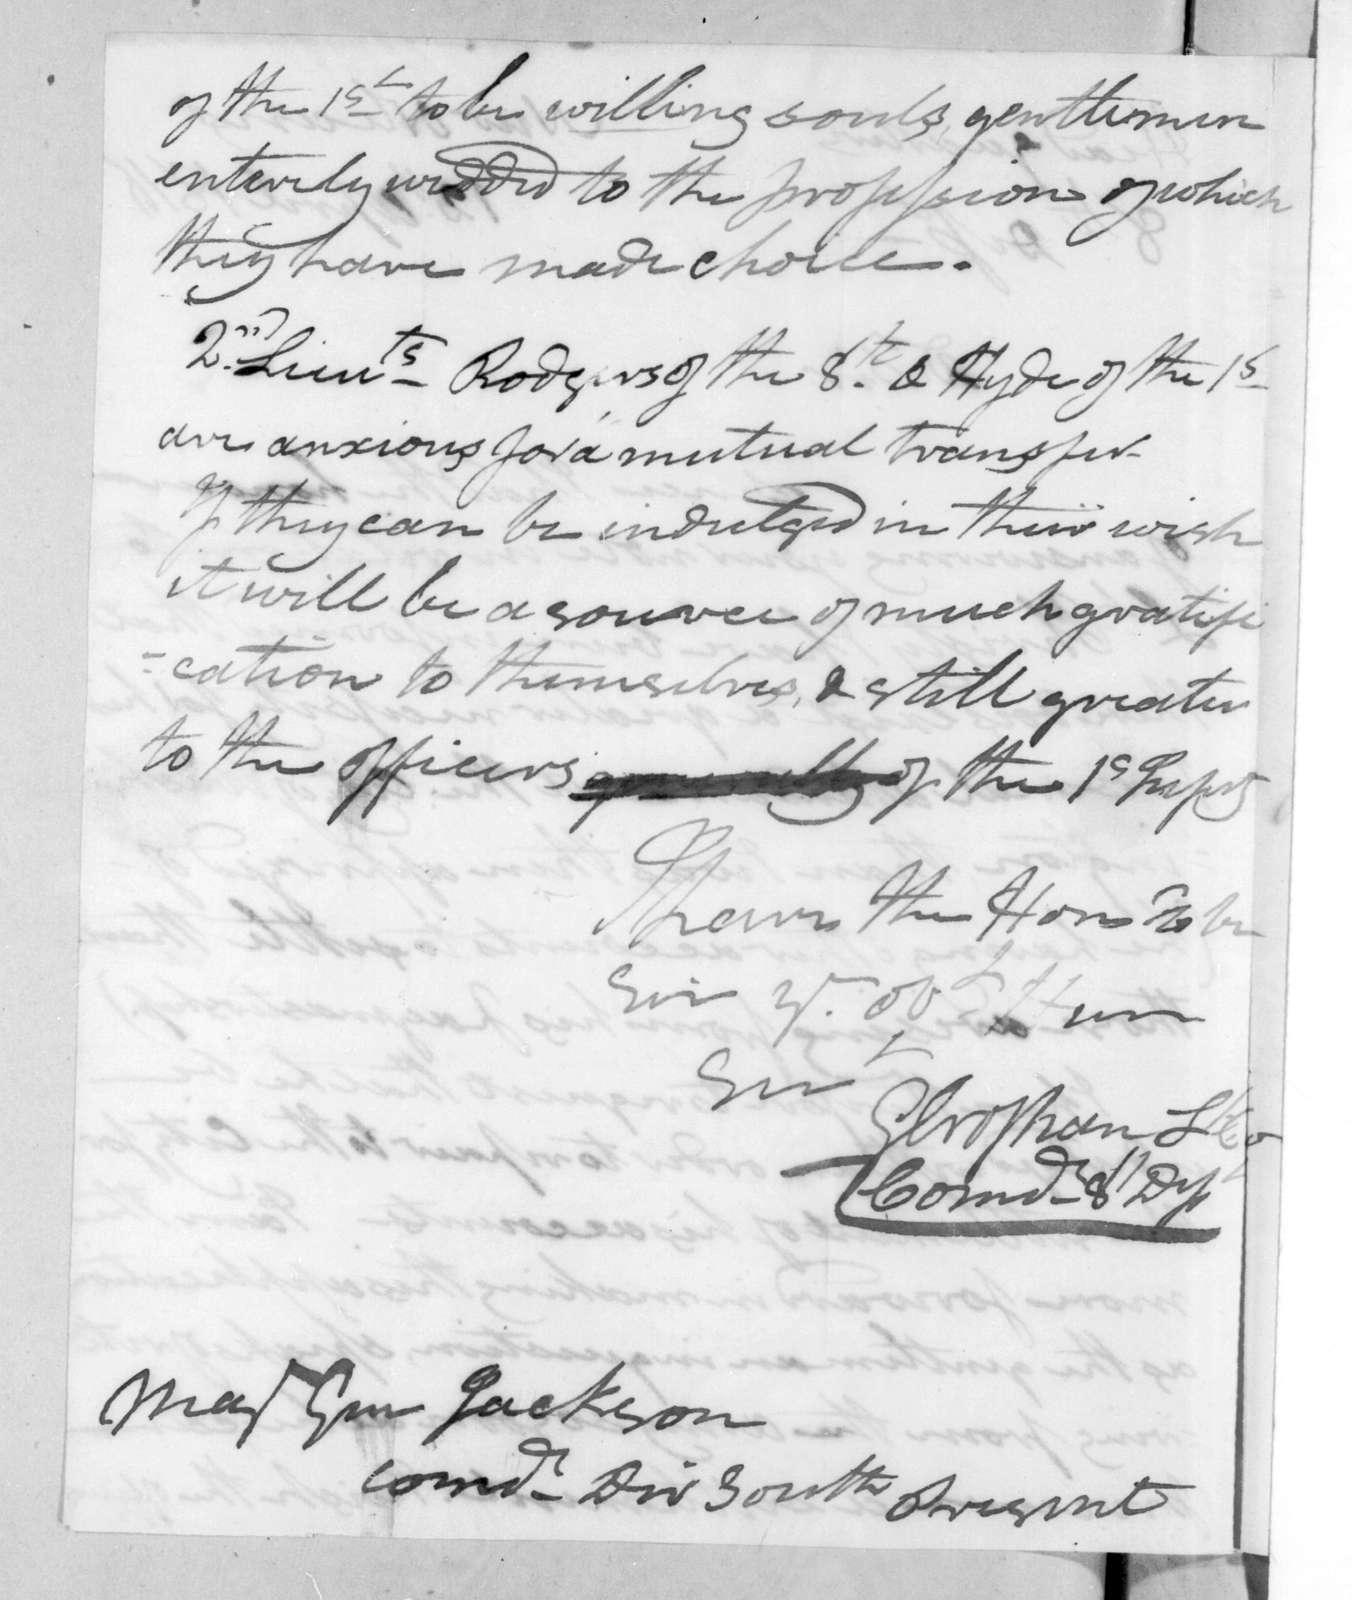 George Croghan to Andrew Jackson, April 12, 1816